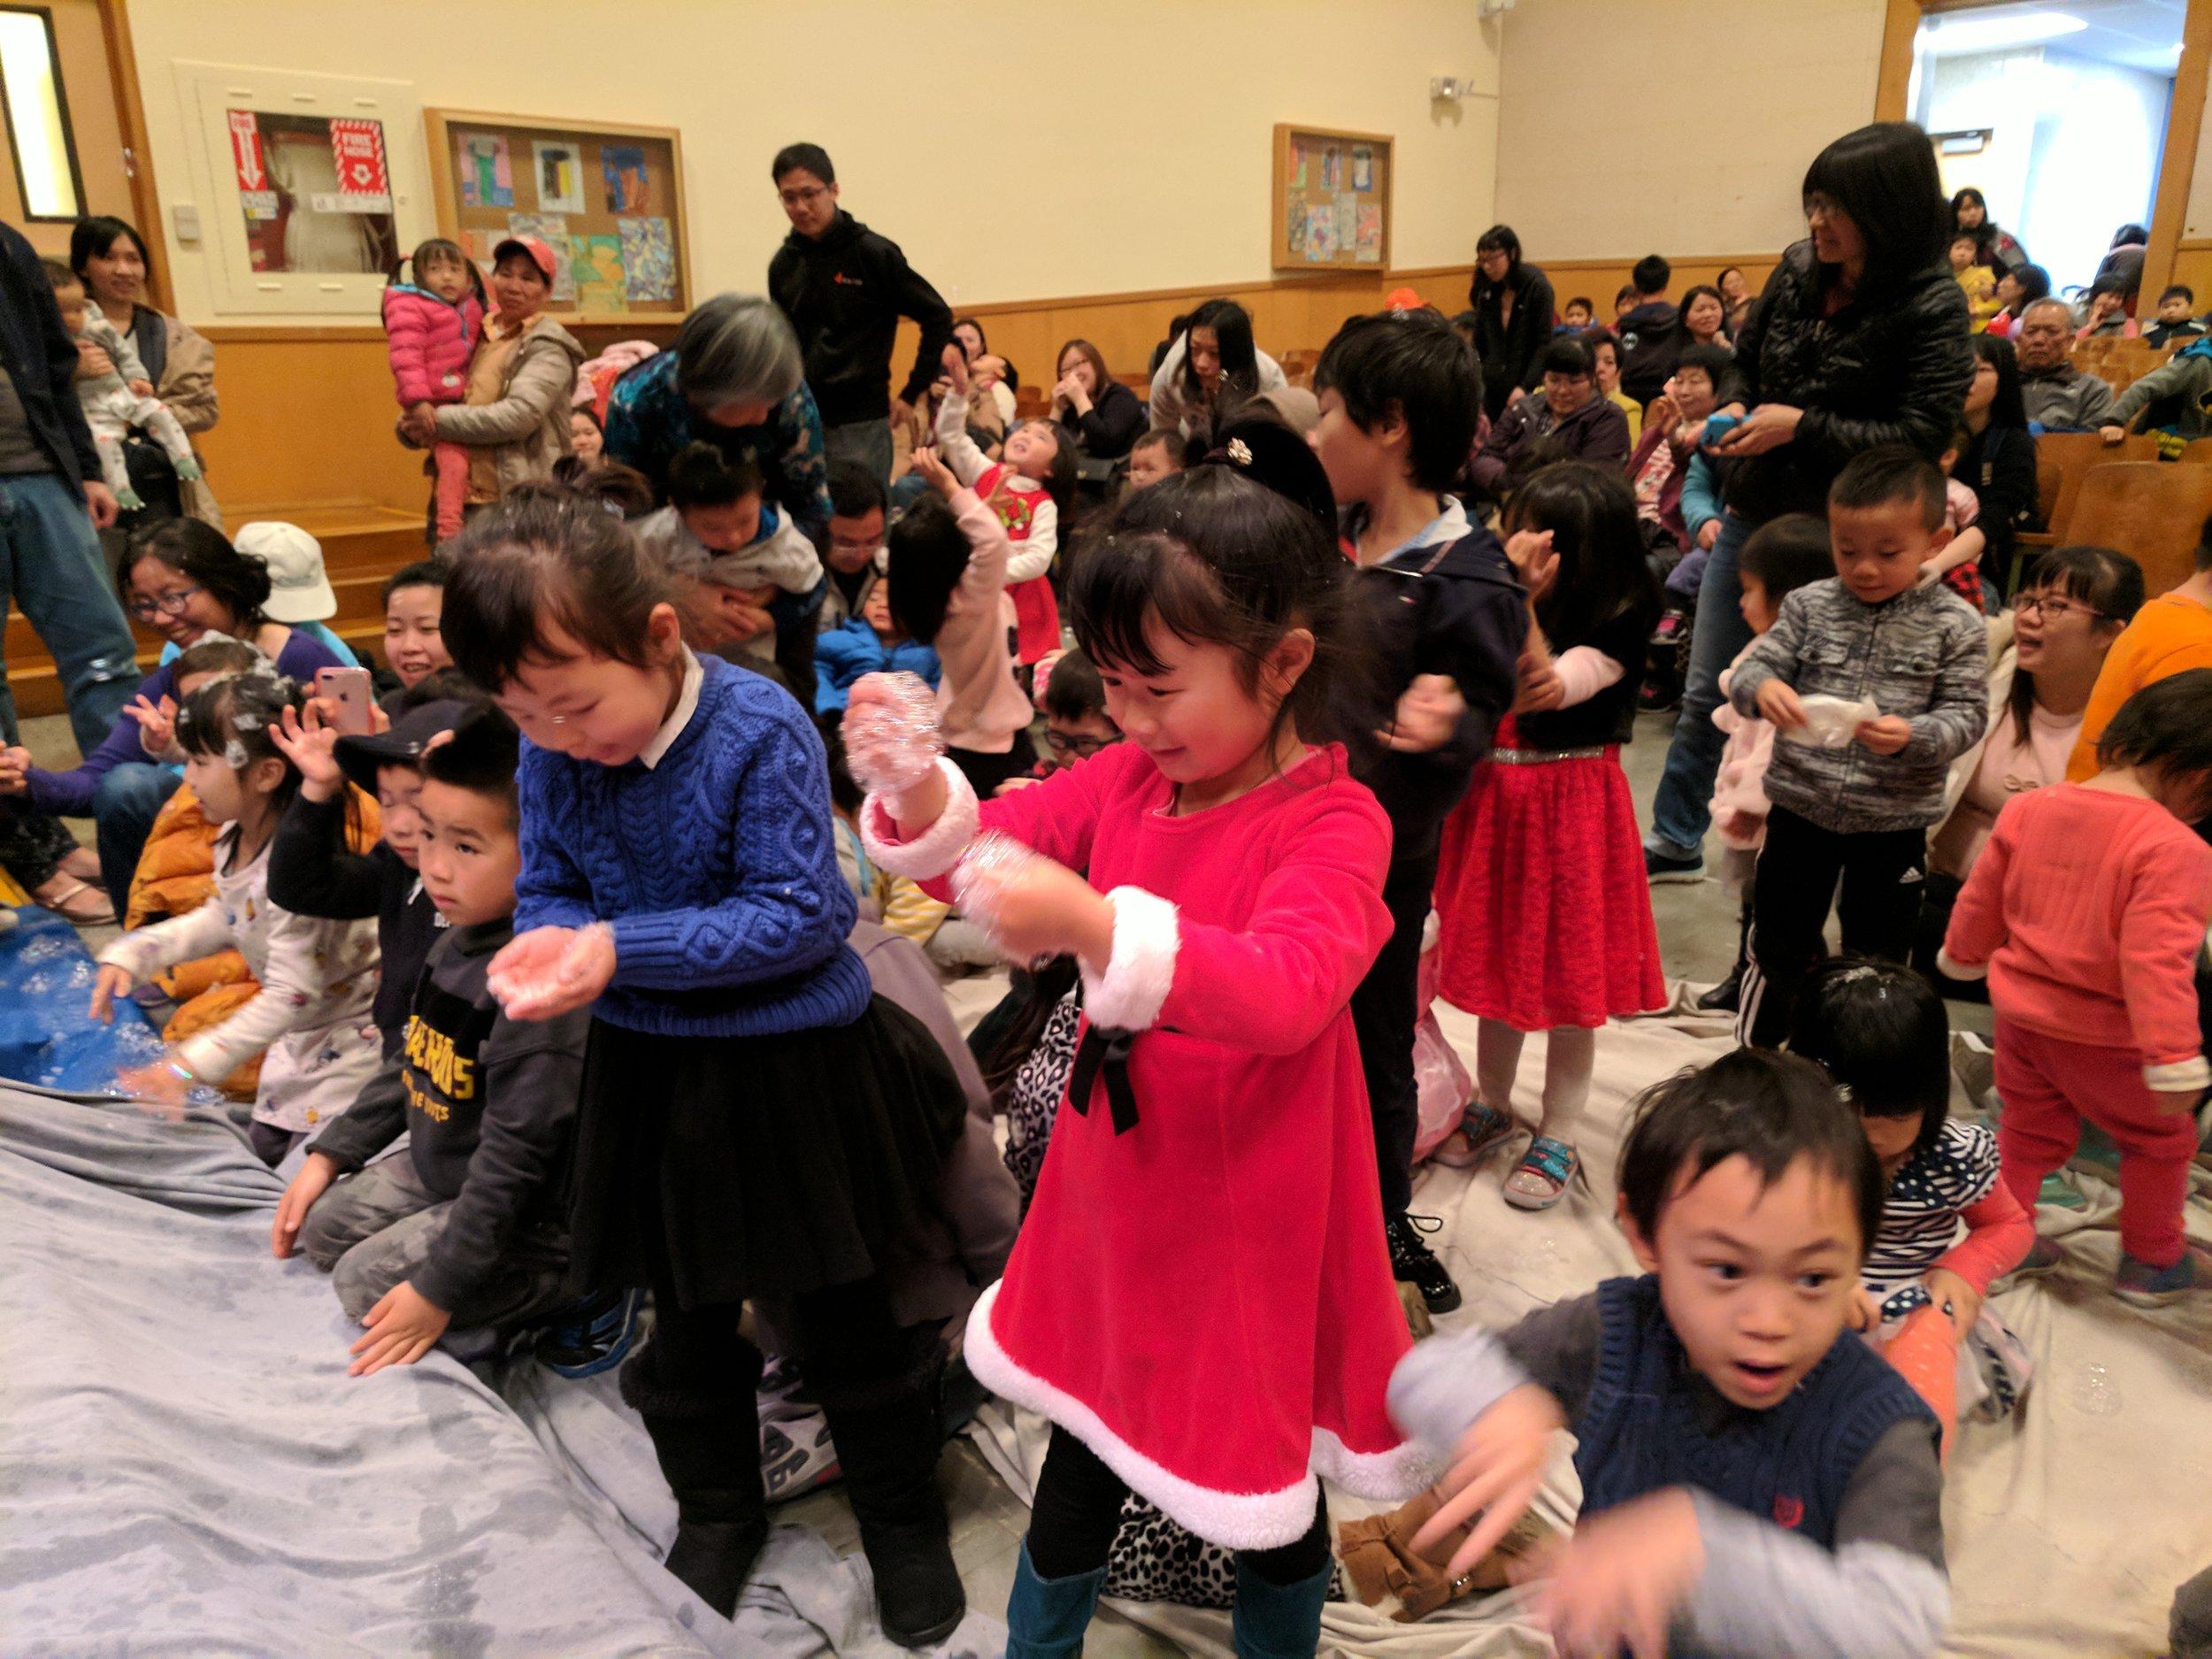 Children and families enjoy